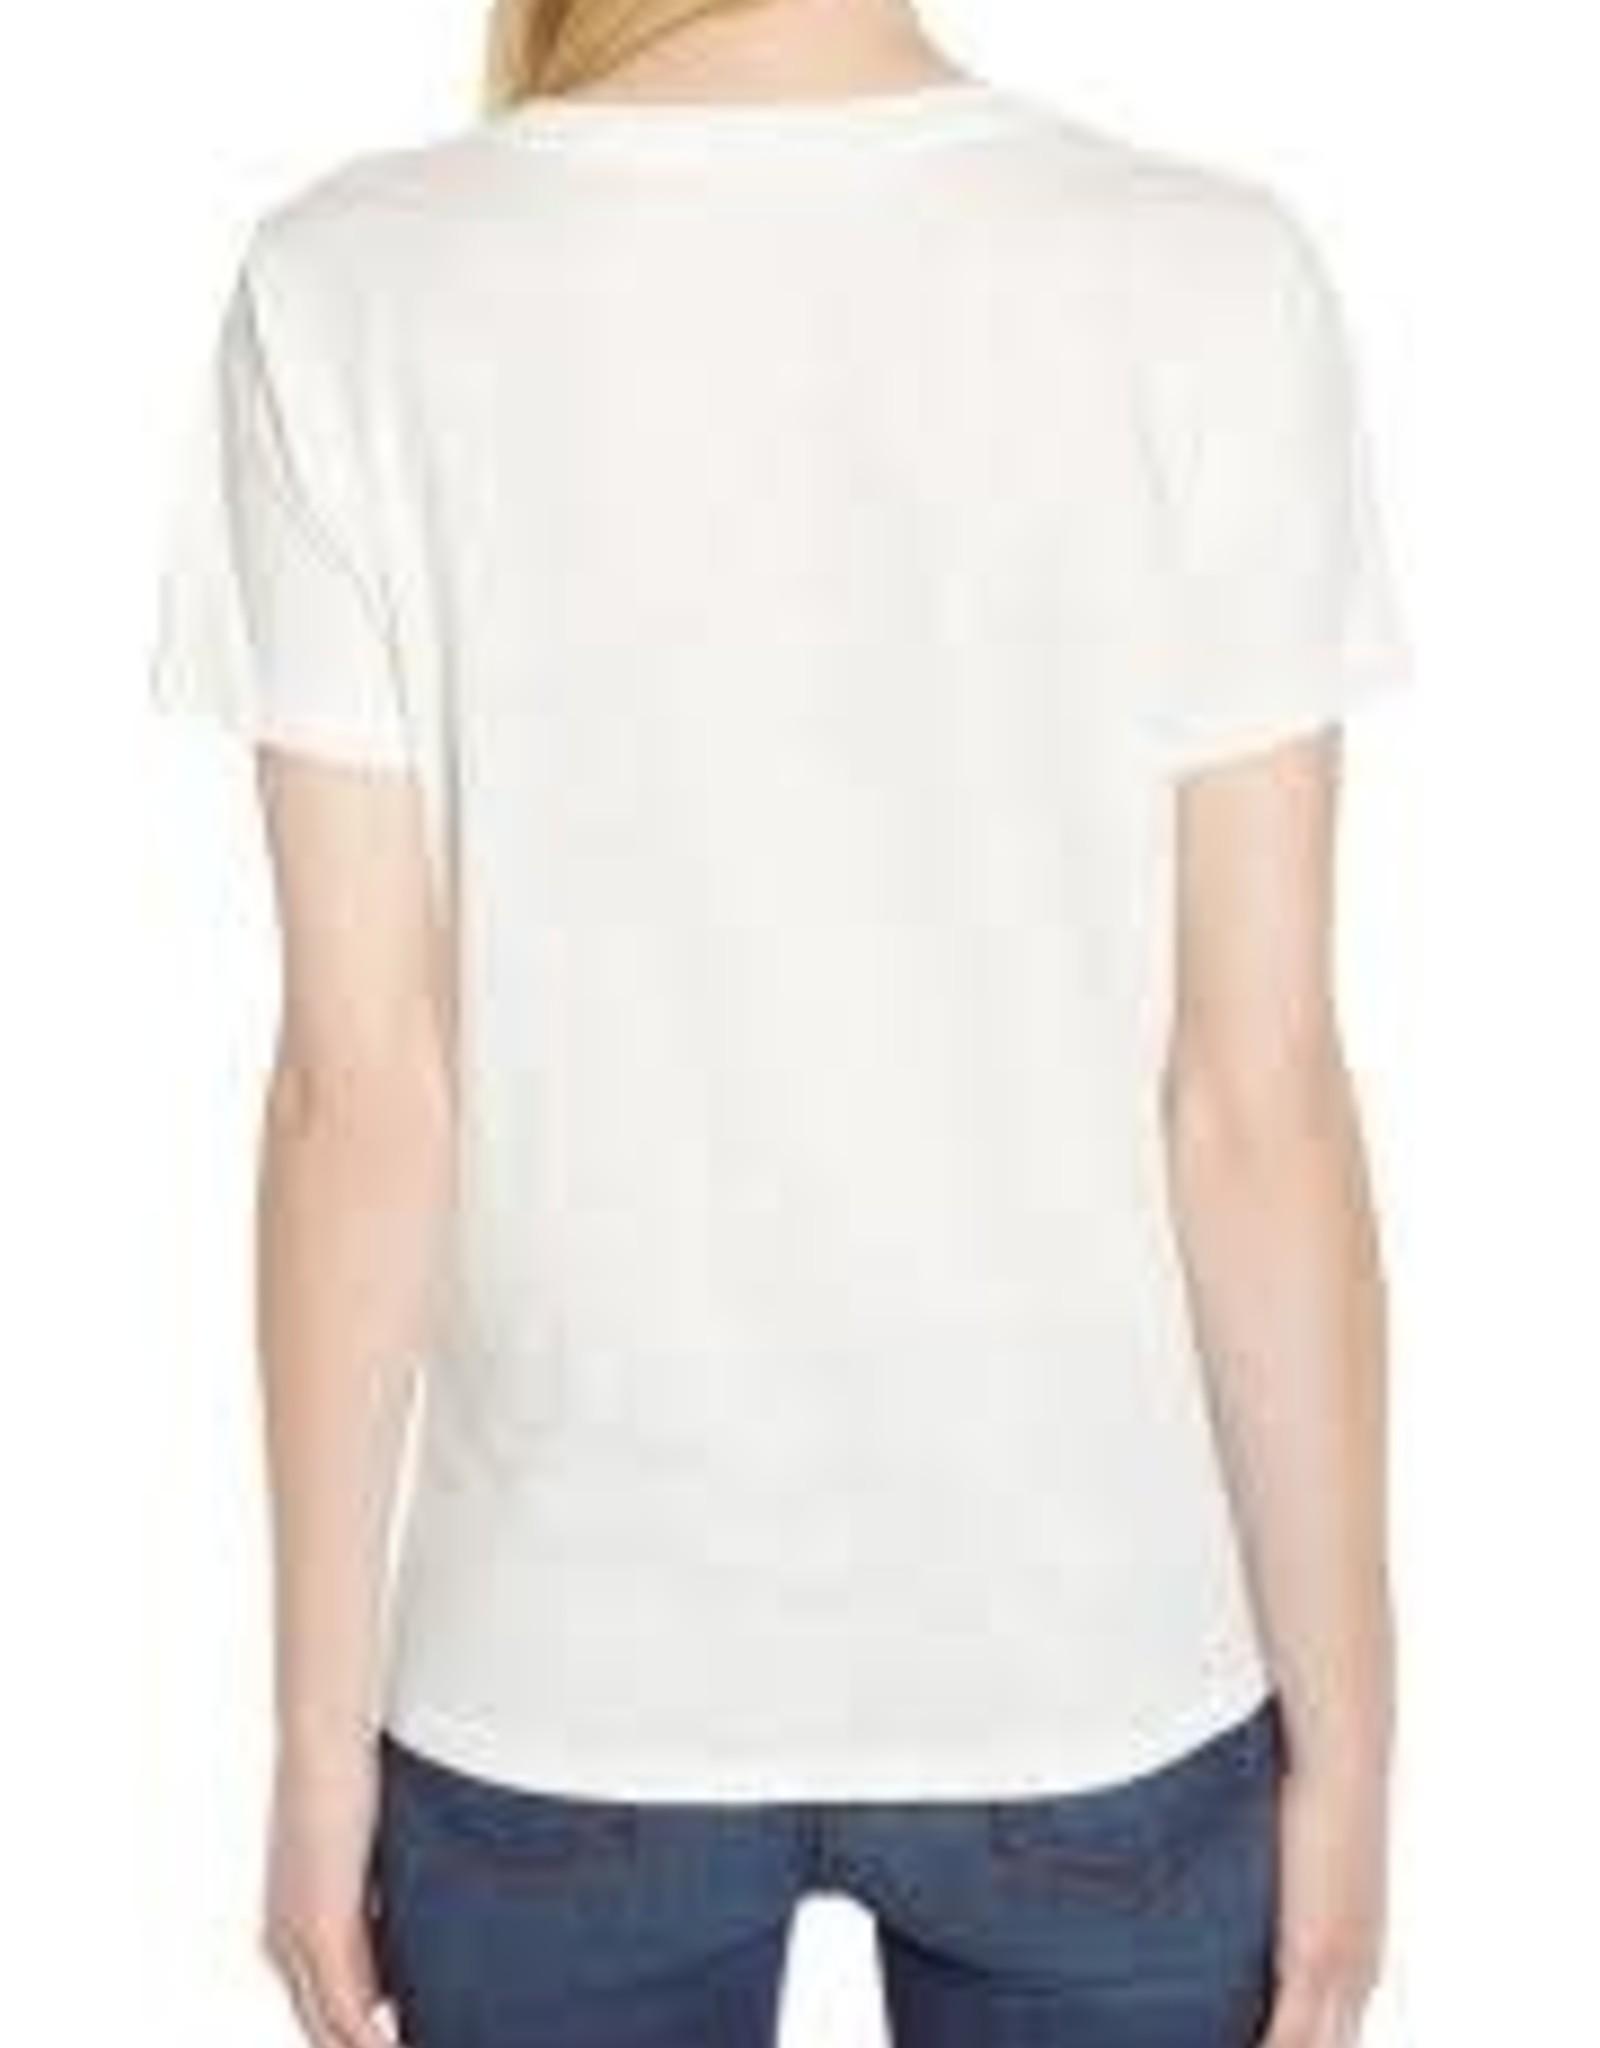 J. Crew J. Crew Tanti Baci Vintage Cotton T-Shirt Size L